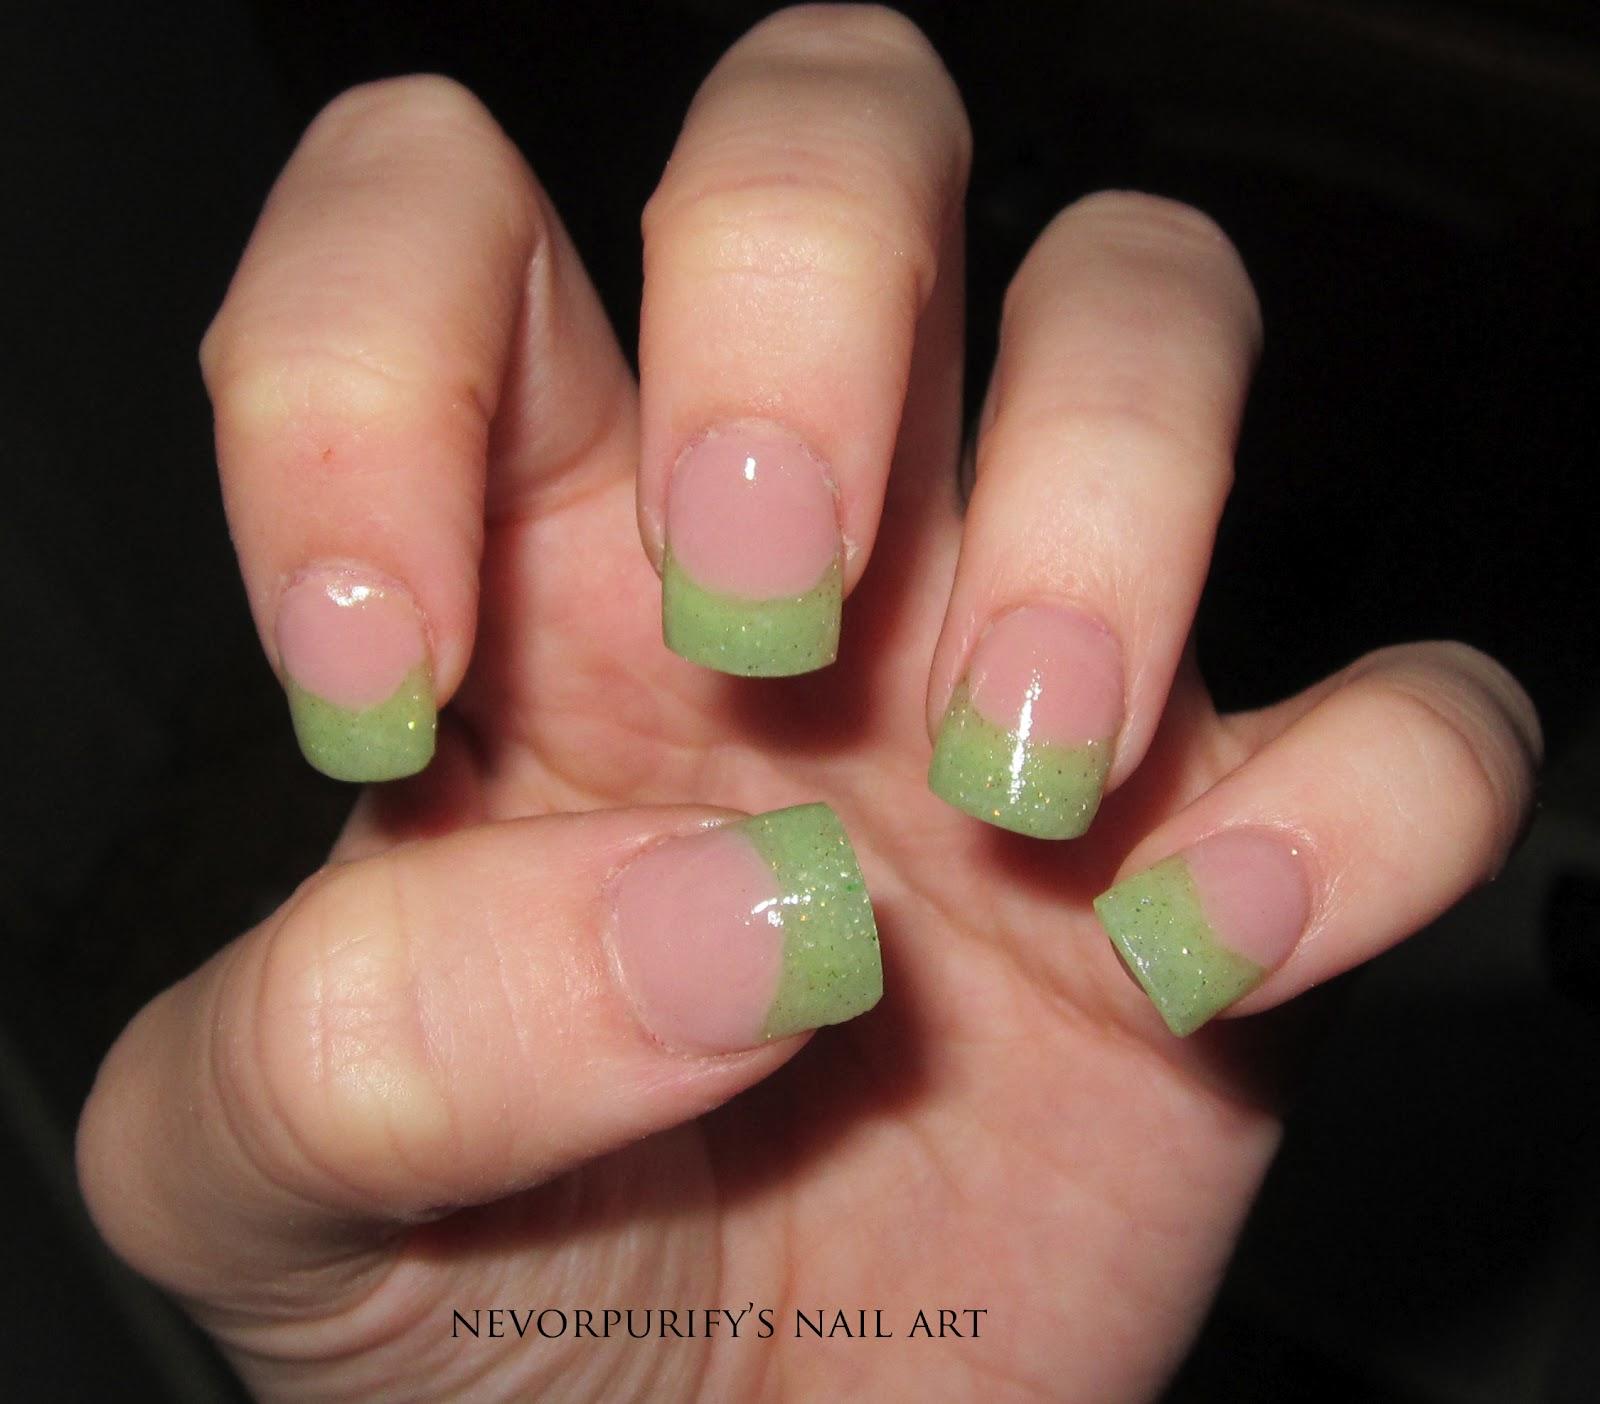 Nail School - Day 33 | Nevorpurify\'s Nail Art